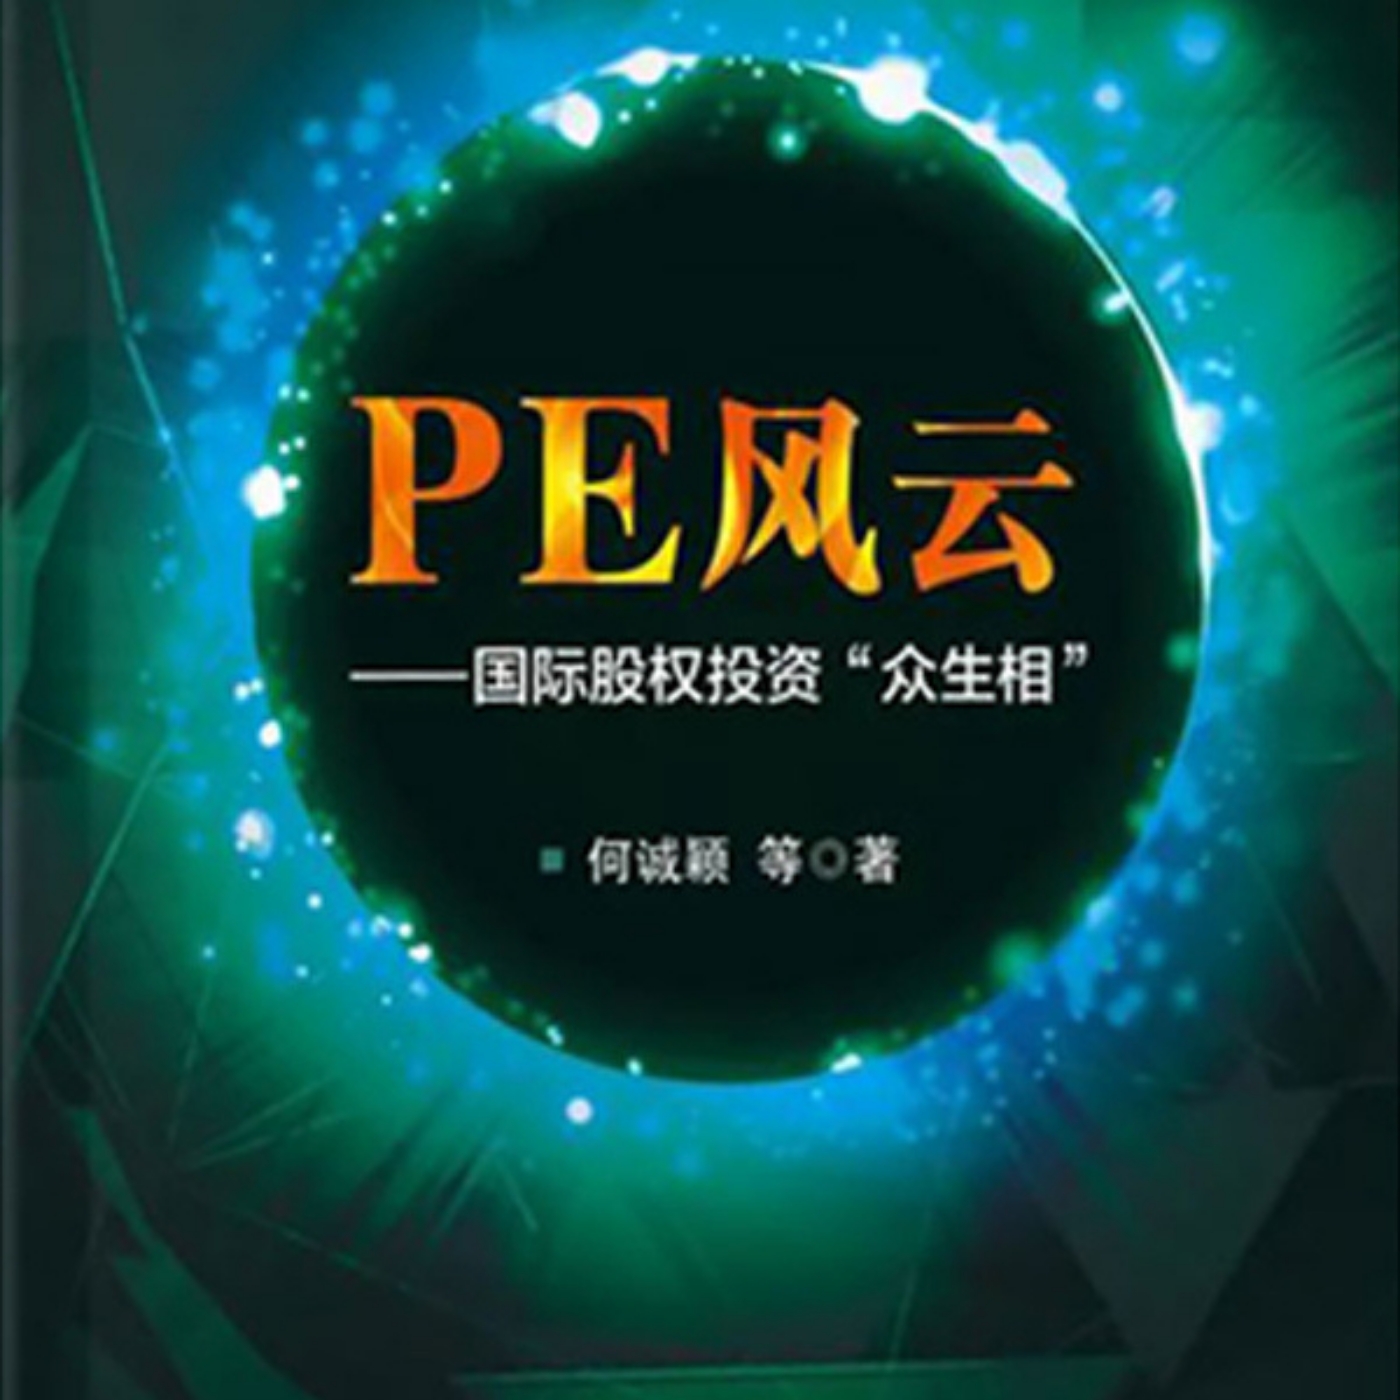 "PE风云:国际股权投资""众生相"""